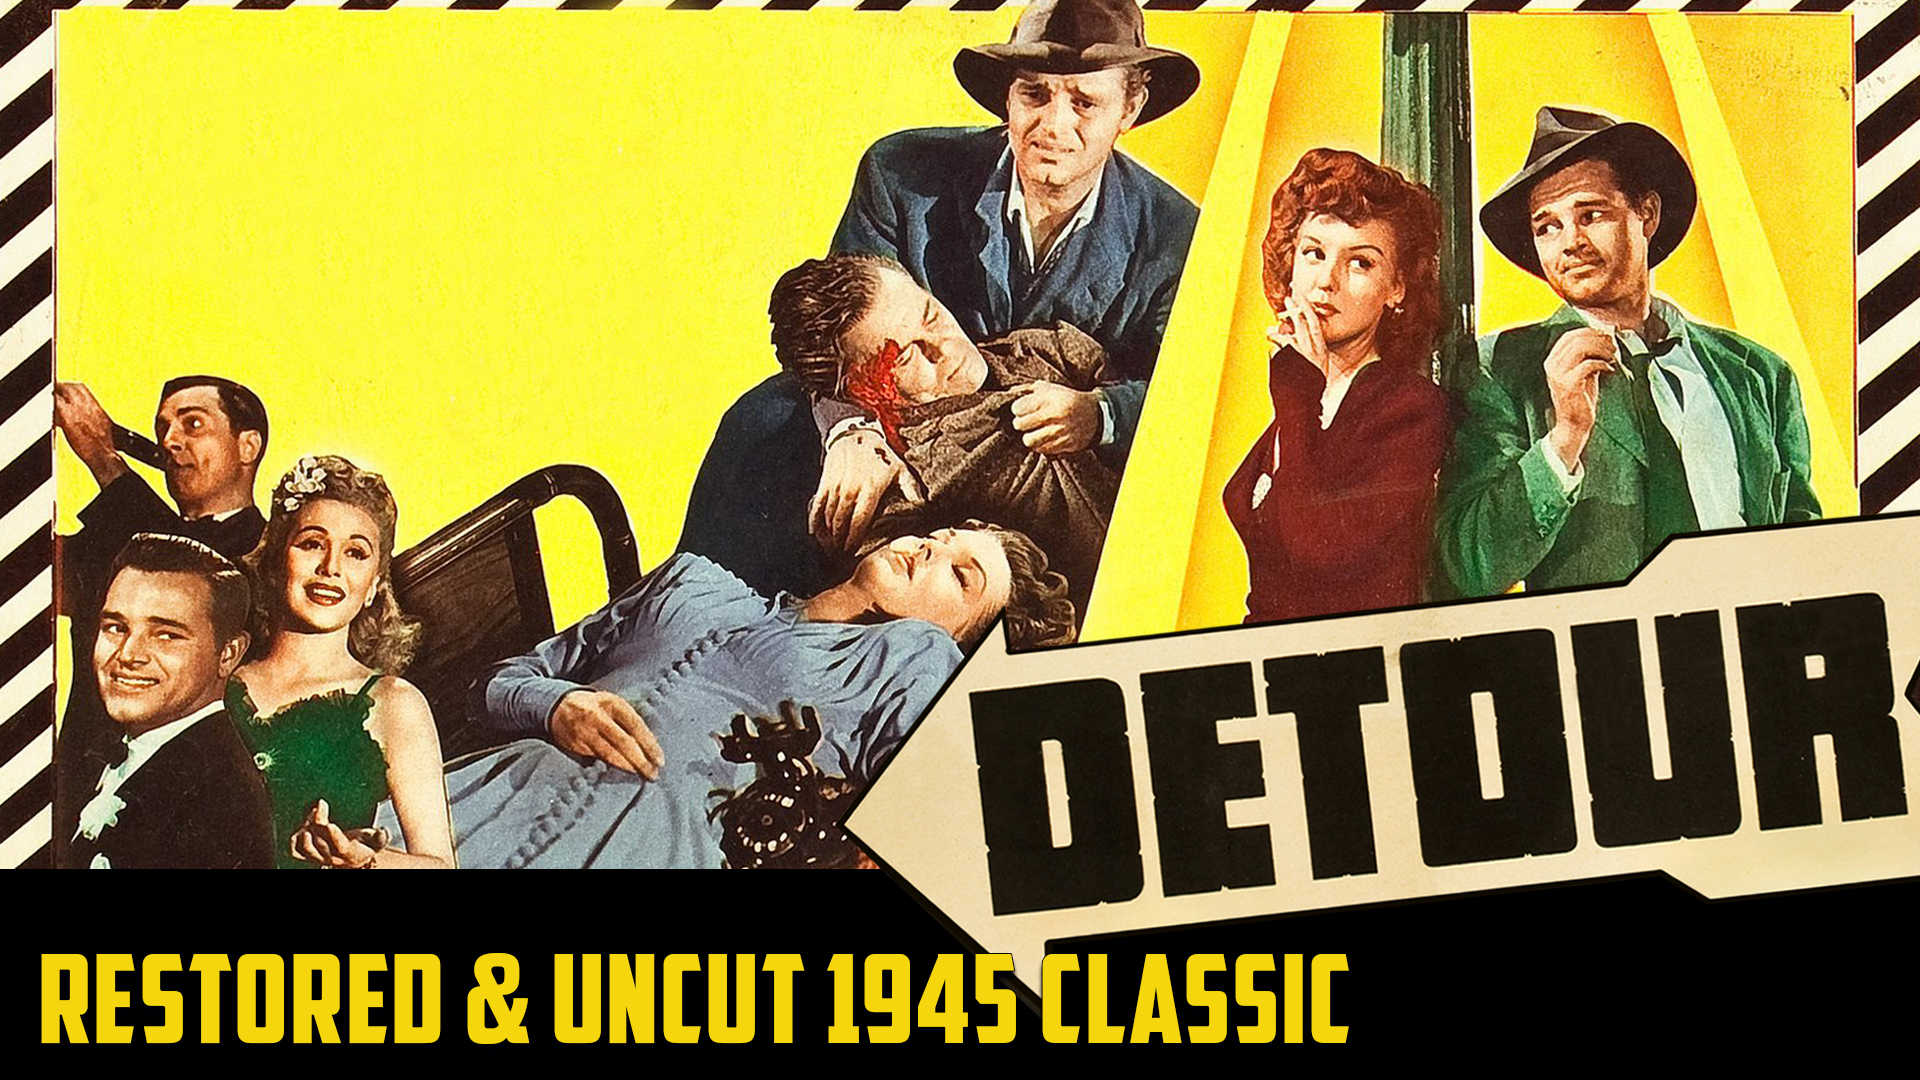 Detour - Restored & Uncut 1945 Classic